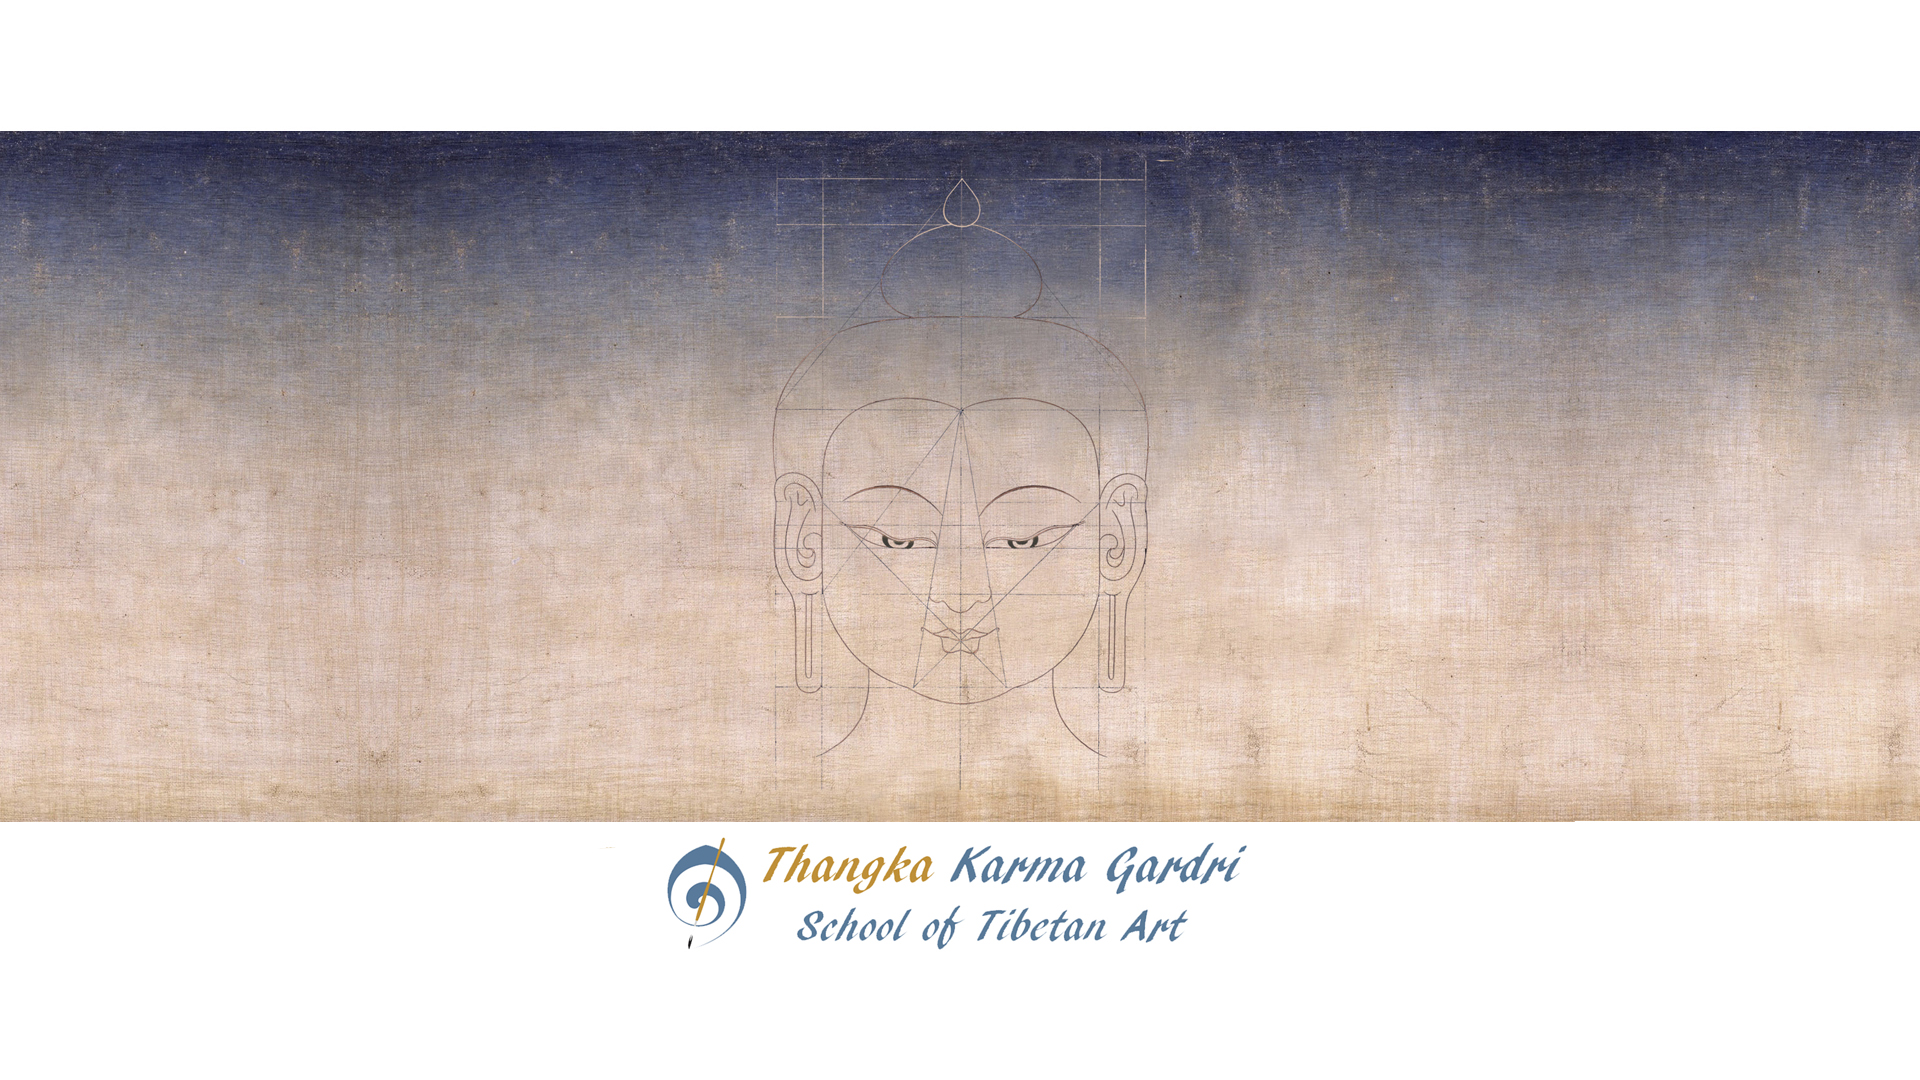 Thangka Karma Gardri School of Tibetan Art